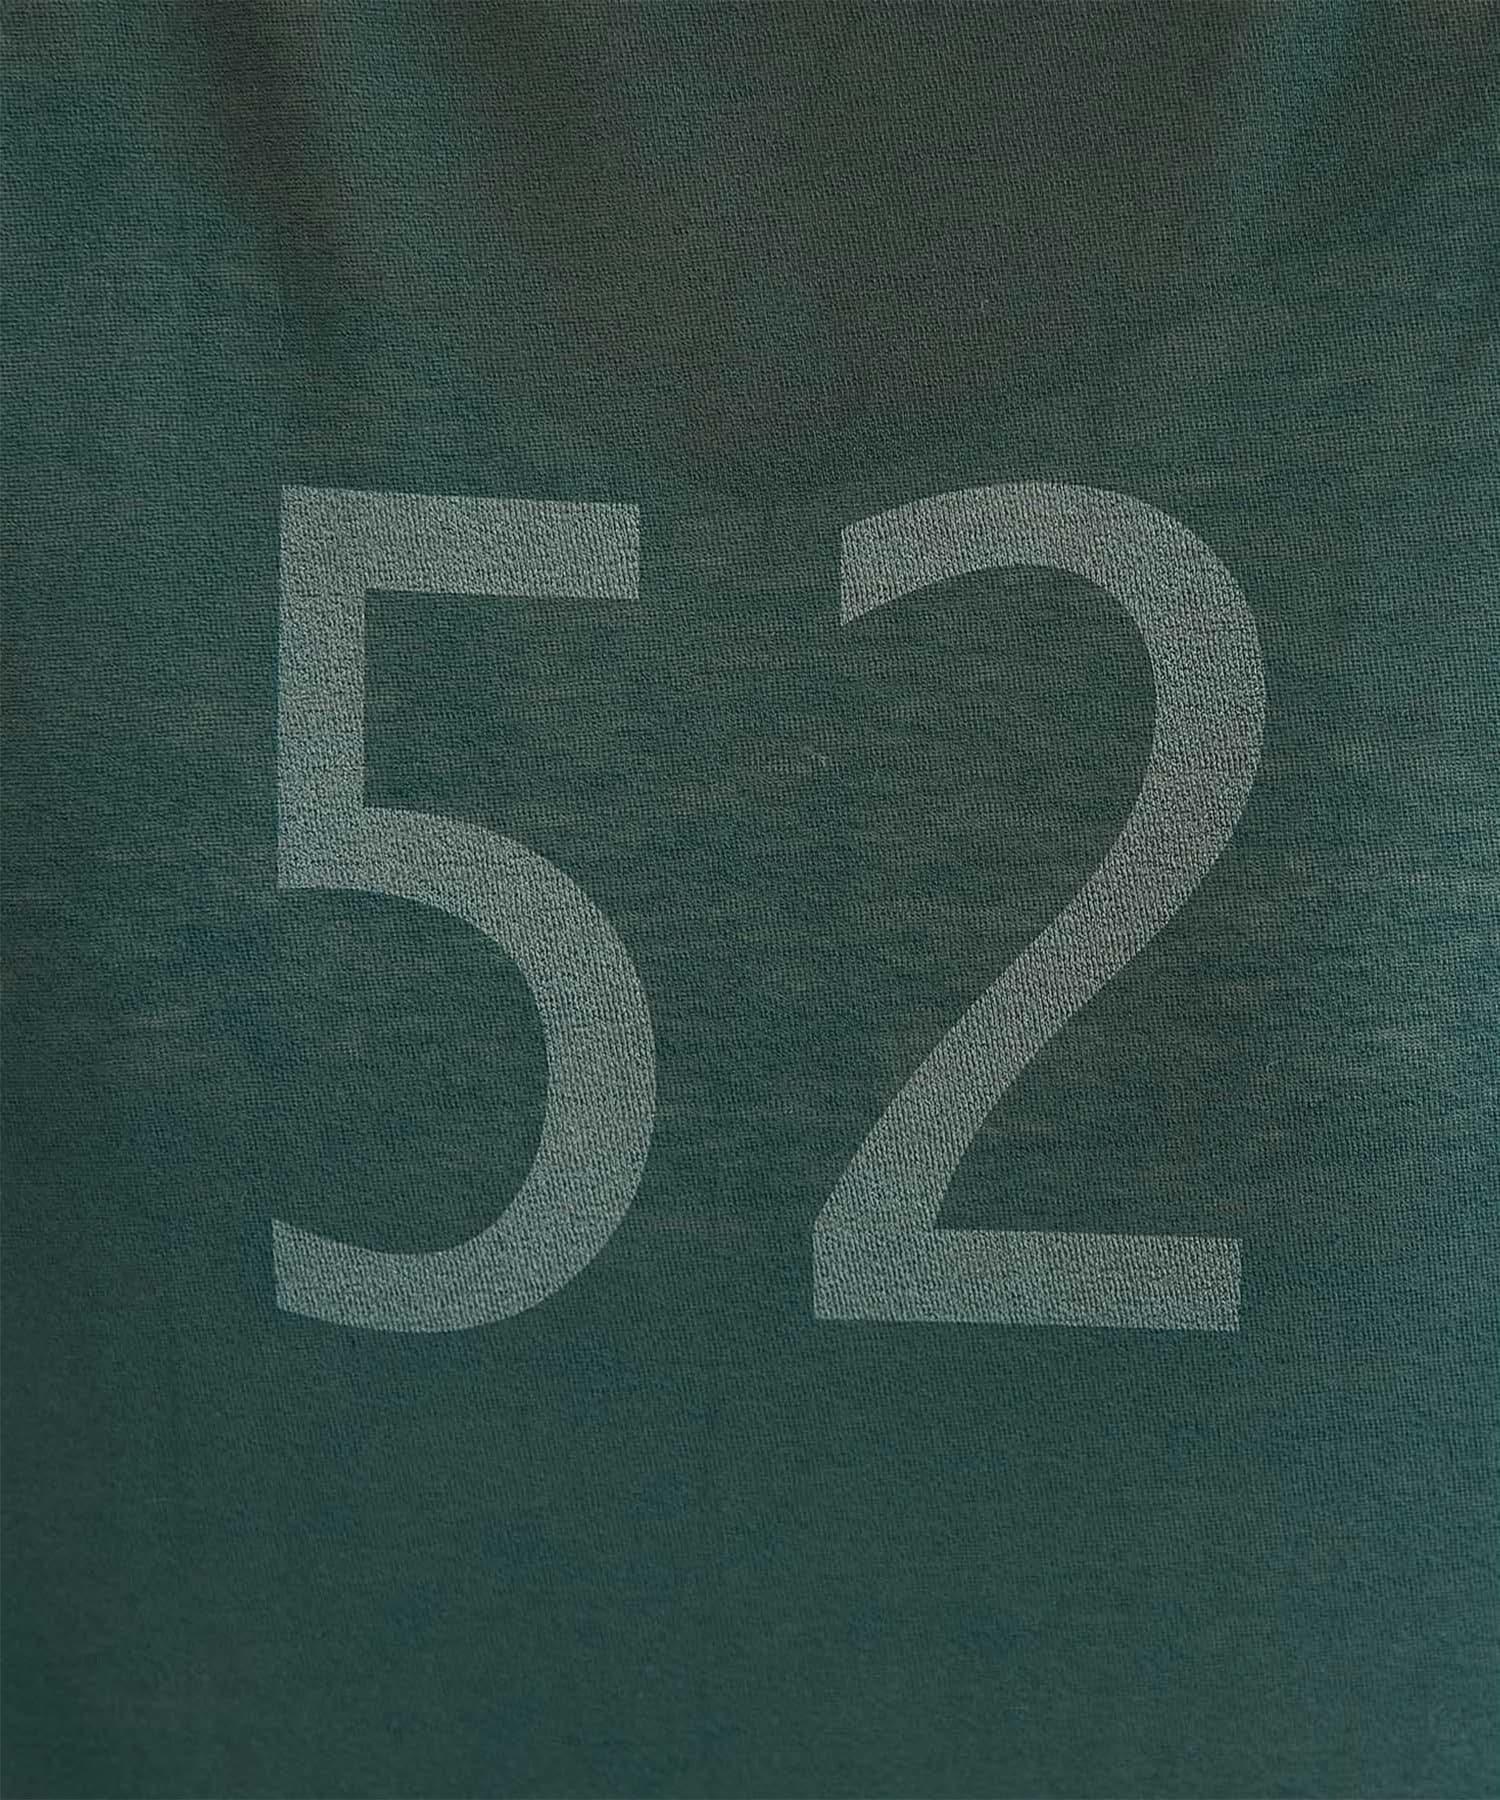 GALLARDAGALANTE(ガリャルダガランテ) 【CEPIE.】シアーナンバーTシャツ